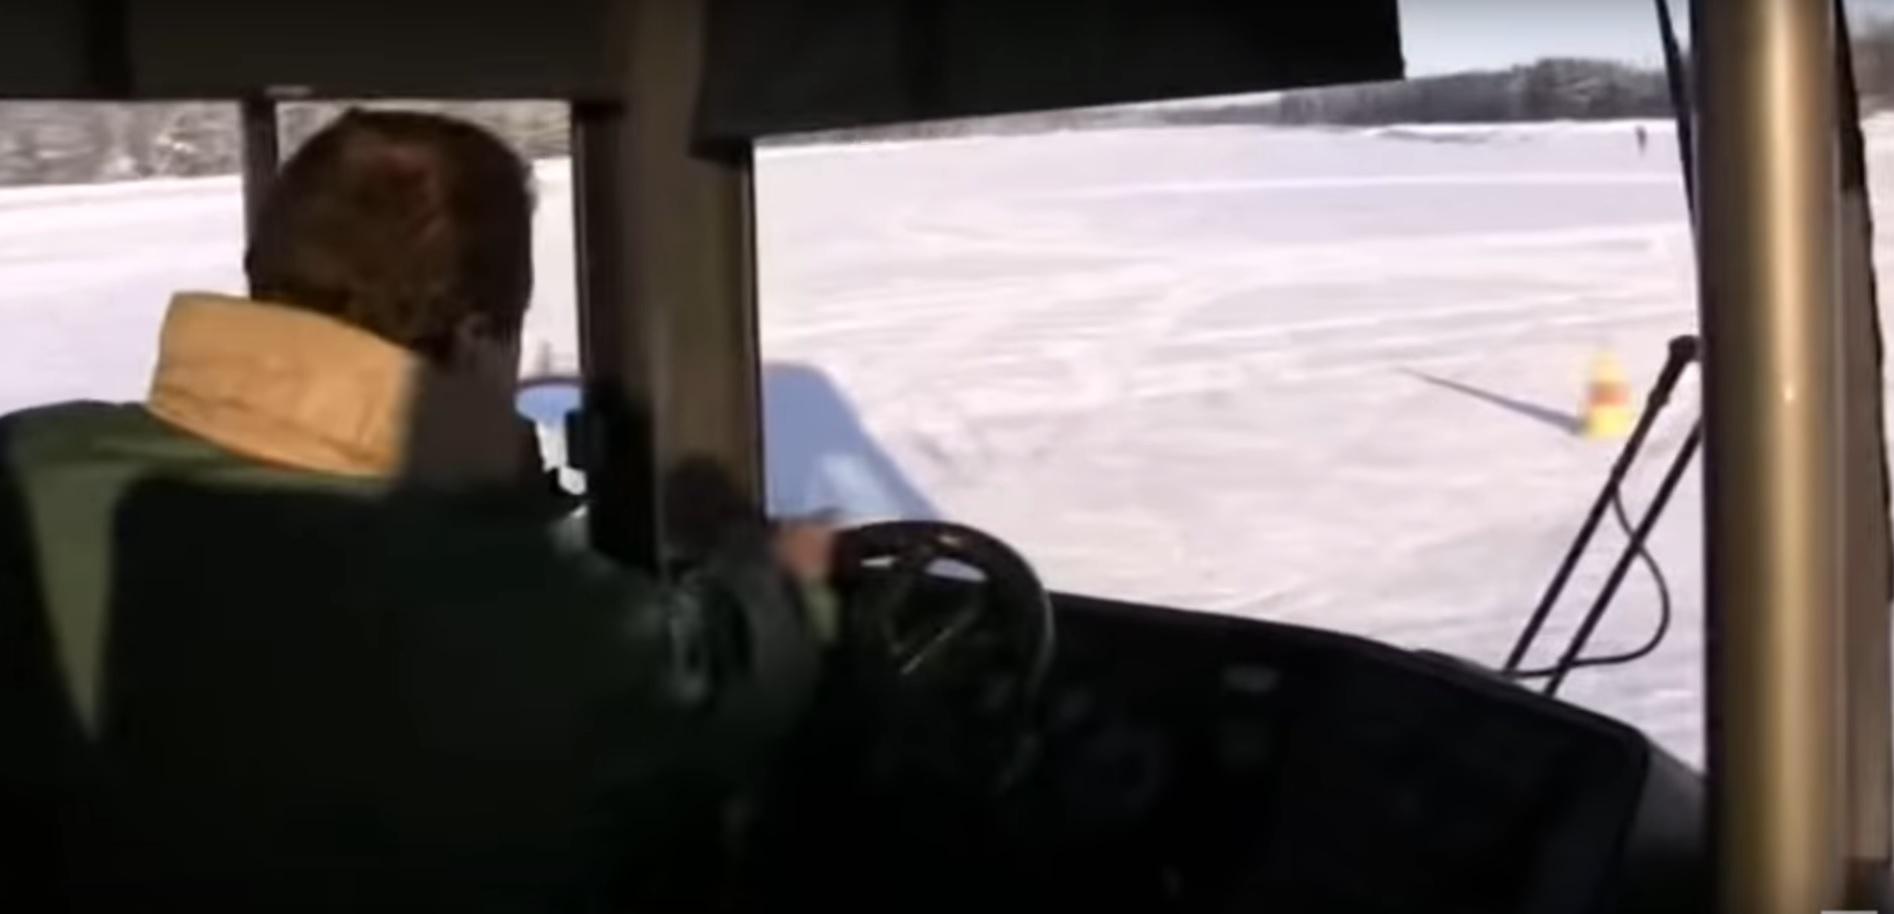 Obrót o 360 stopni autobusem